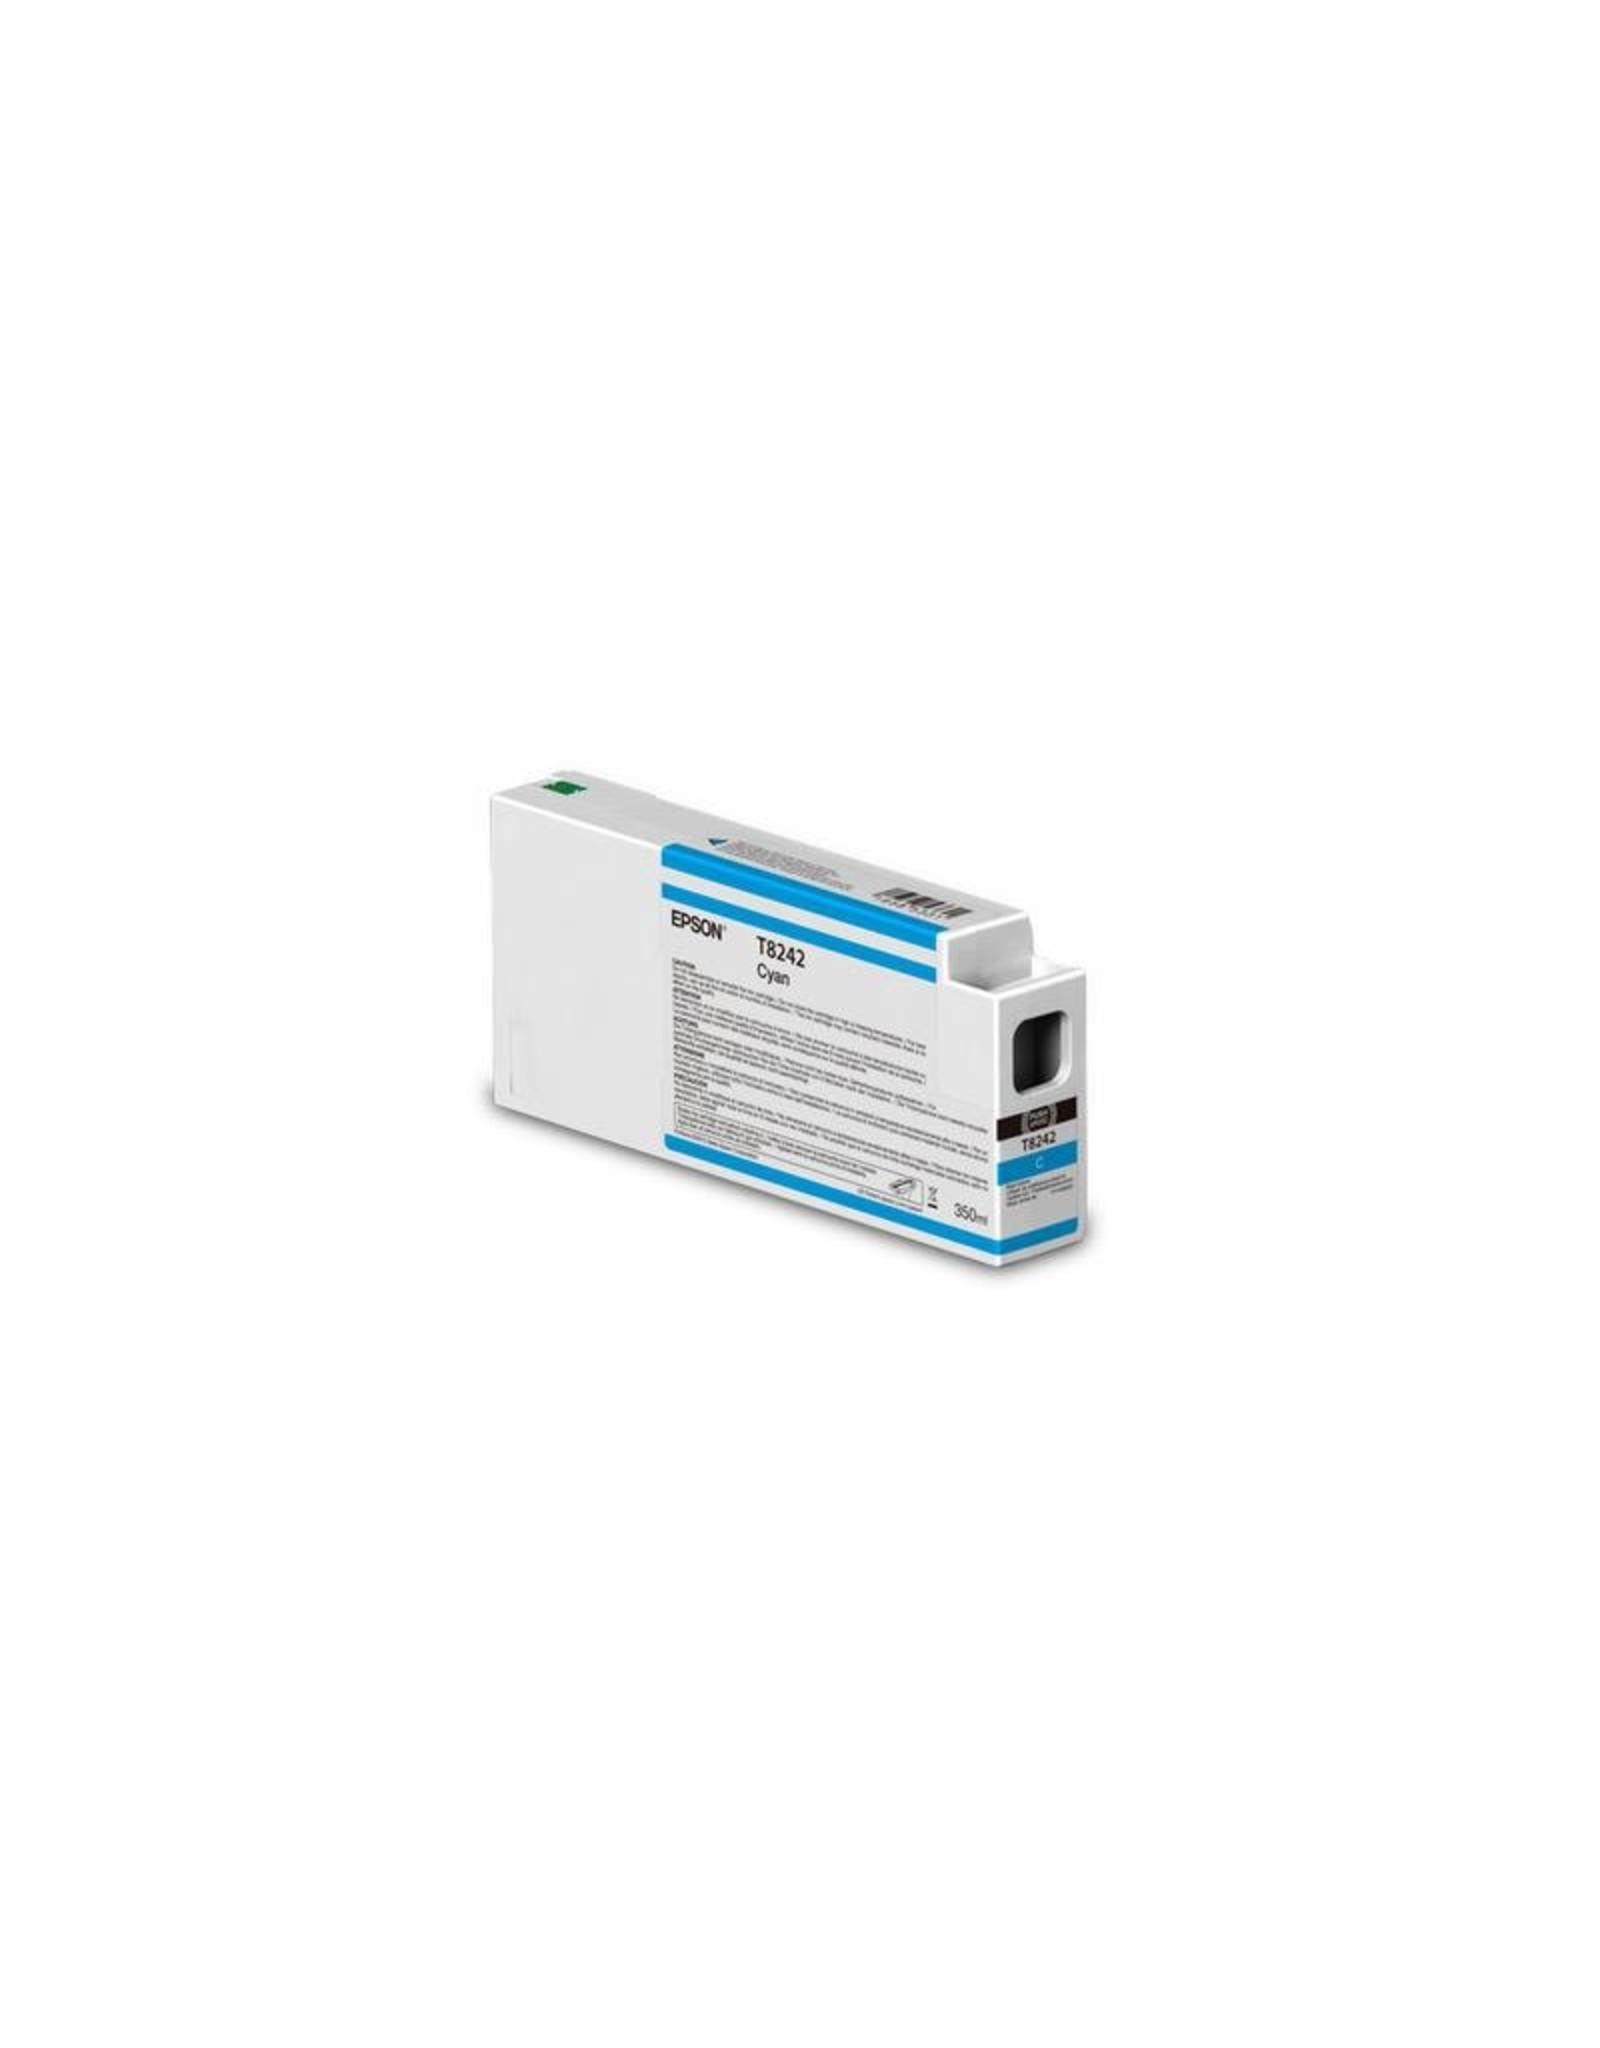 Epson Epson T824200 Ultrachrome HD Cyan Ink 350ML